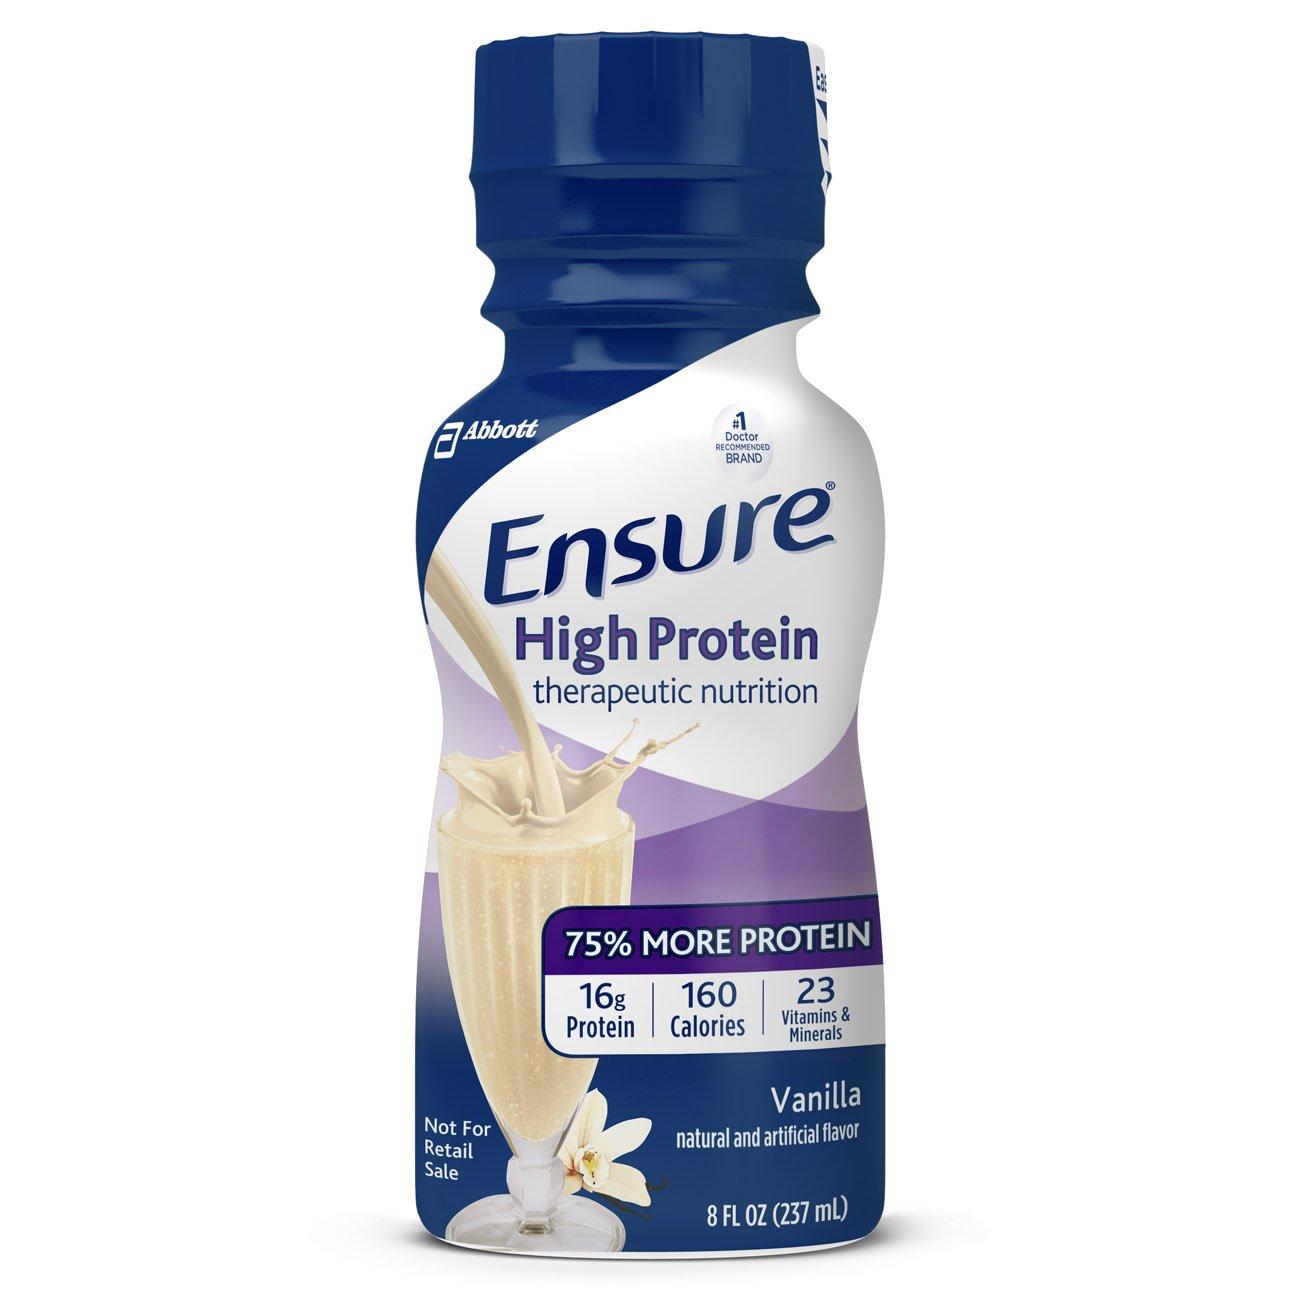 Ensure High Protein Vanilla Flavor 8 oz. Bottle Ready to Use, 64136 - EACH